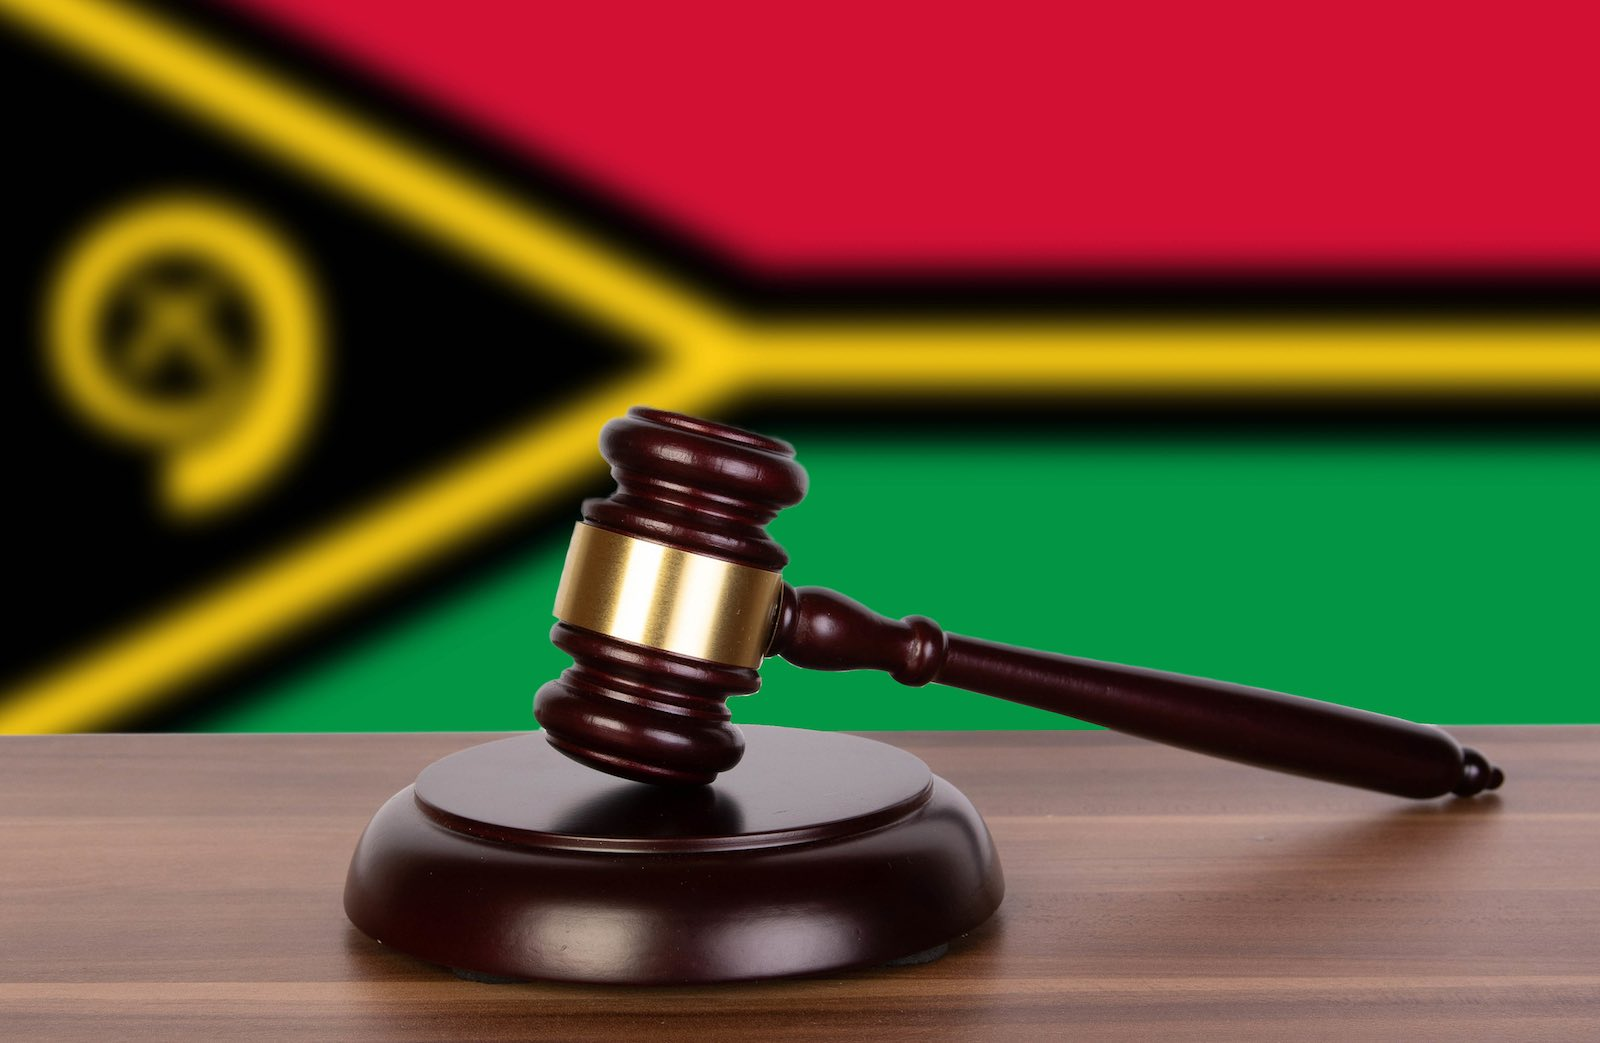 Vanuatu has a new justice (Photo: Marco Verch/Flickr)